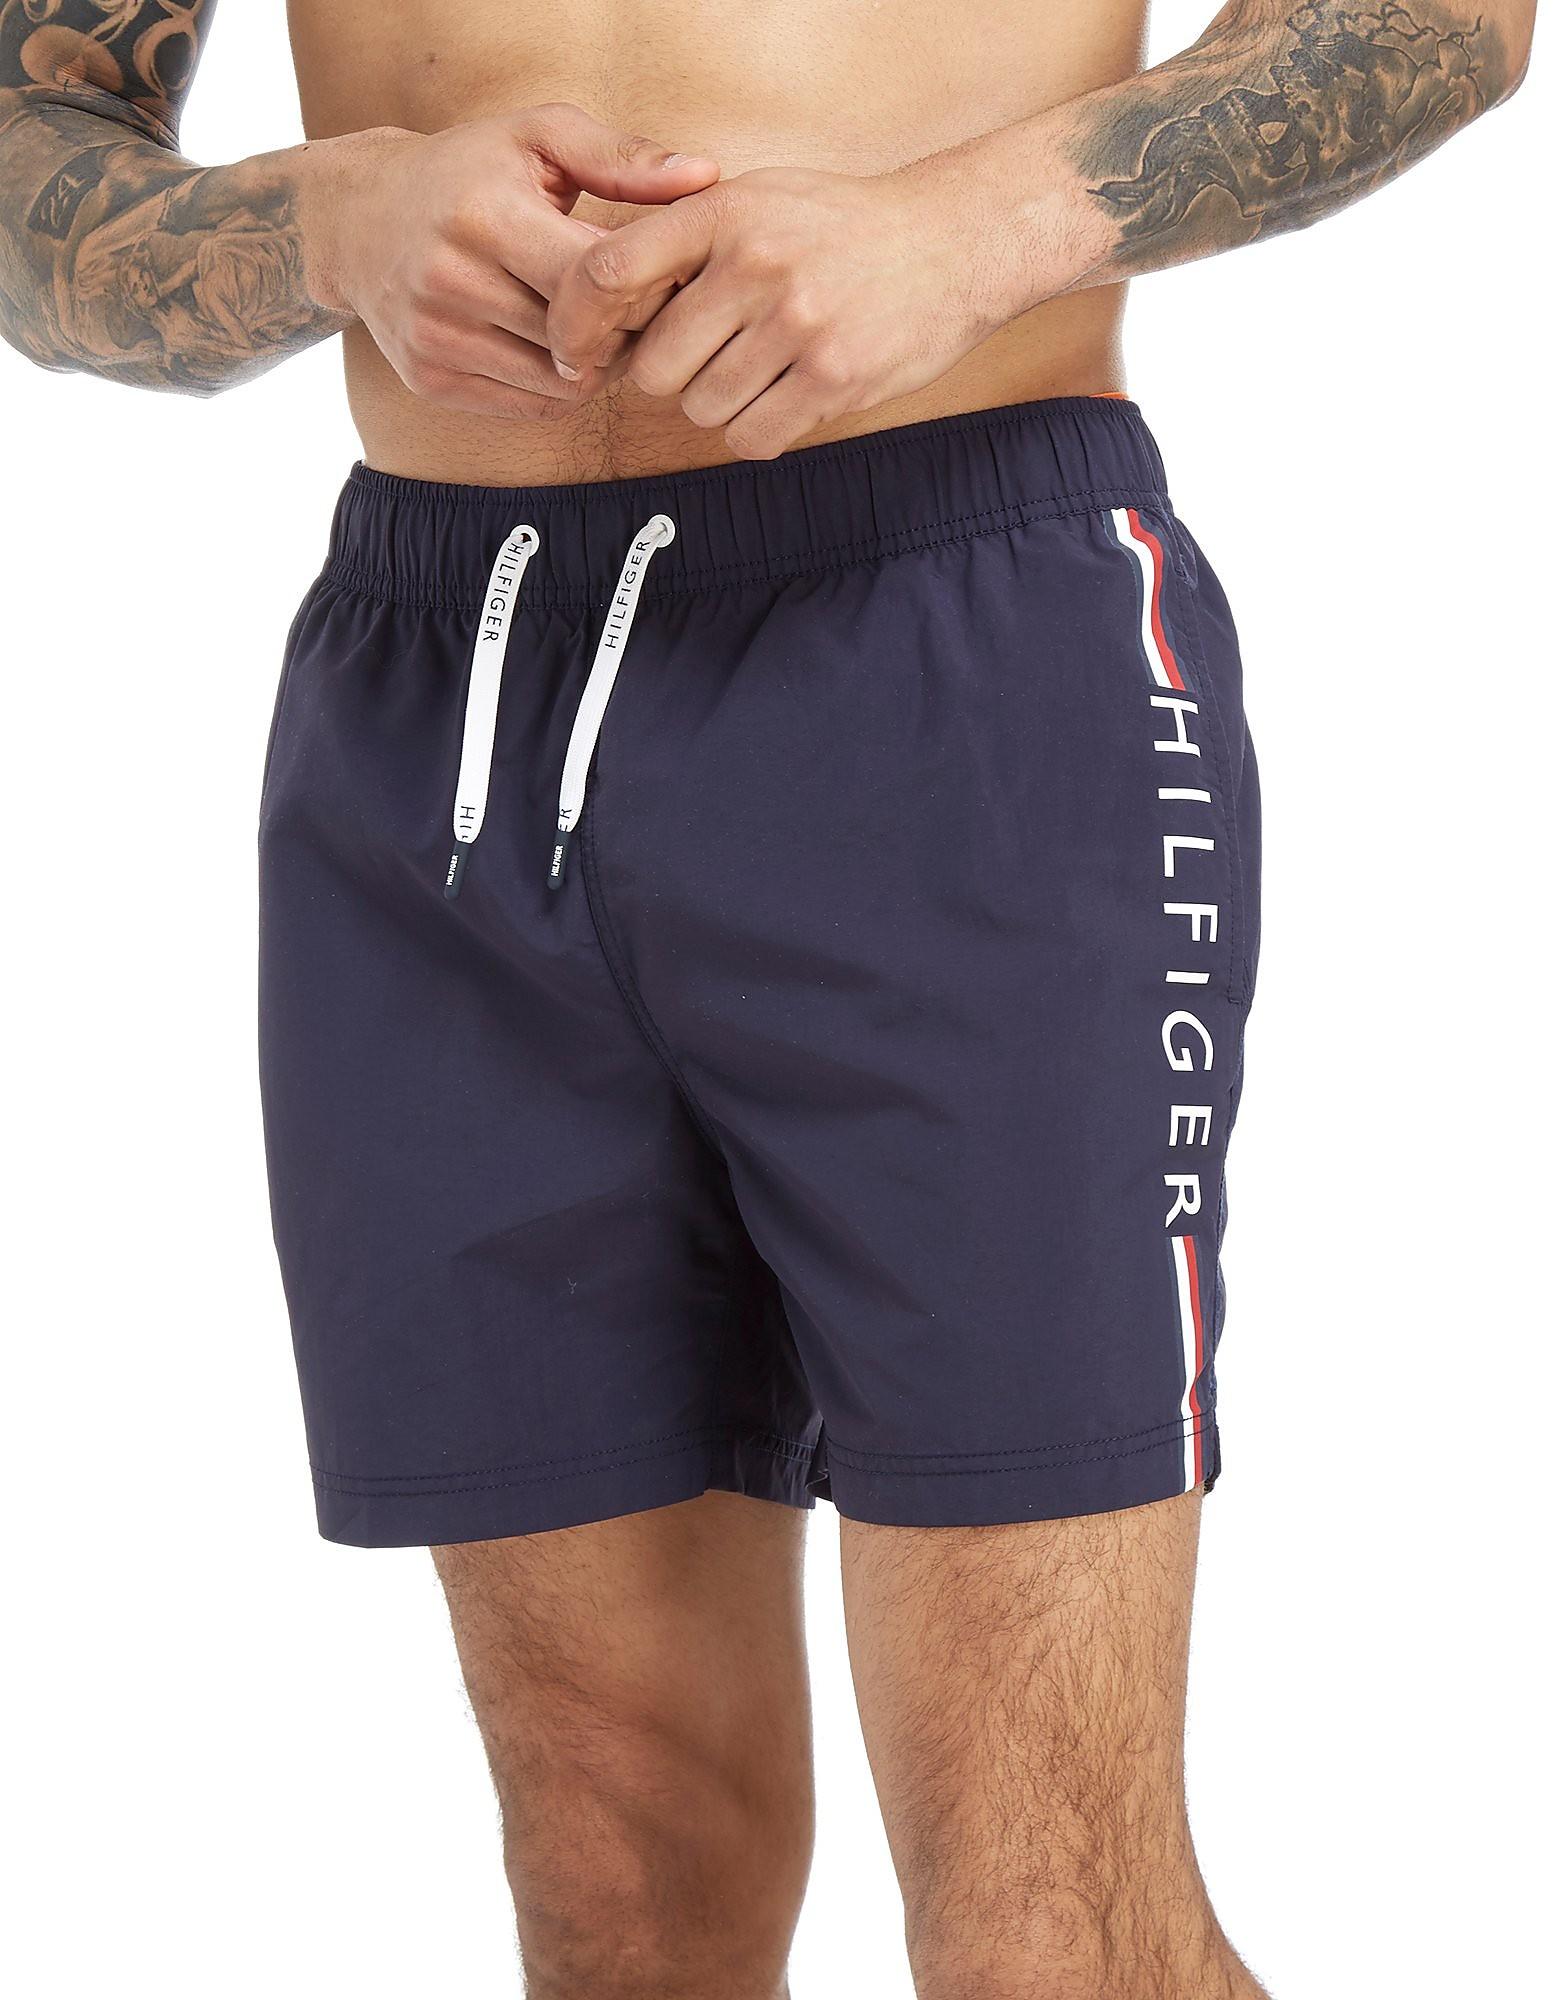 Tommy Hilfiger Side Print Swim Shorts